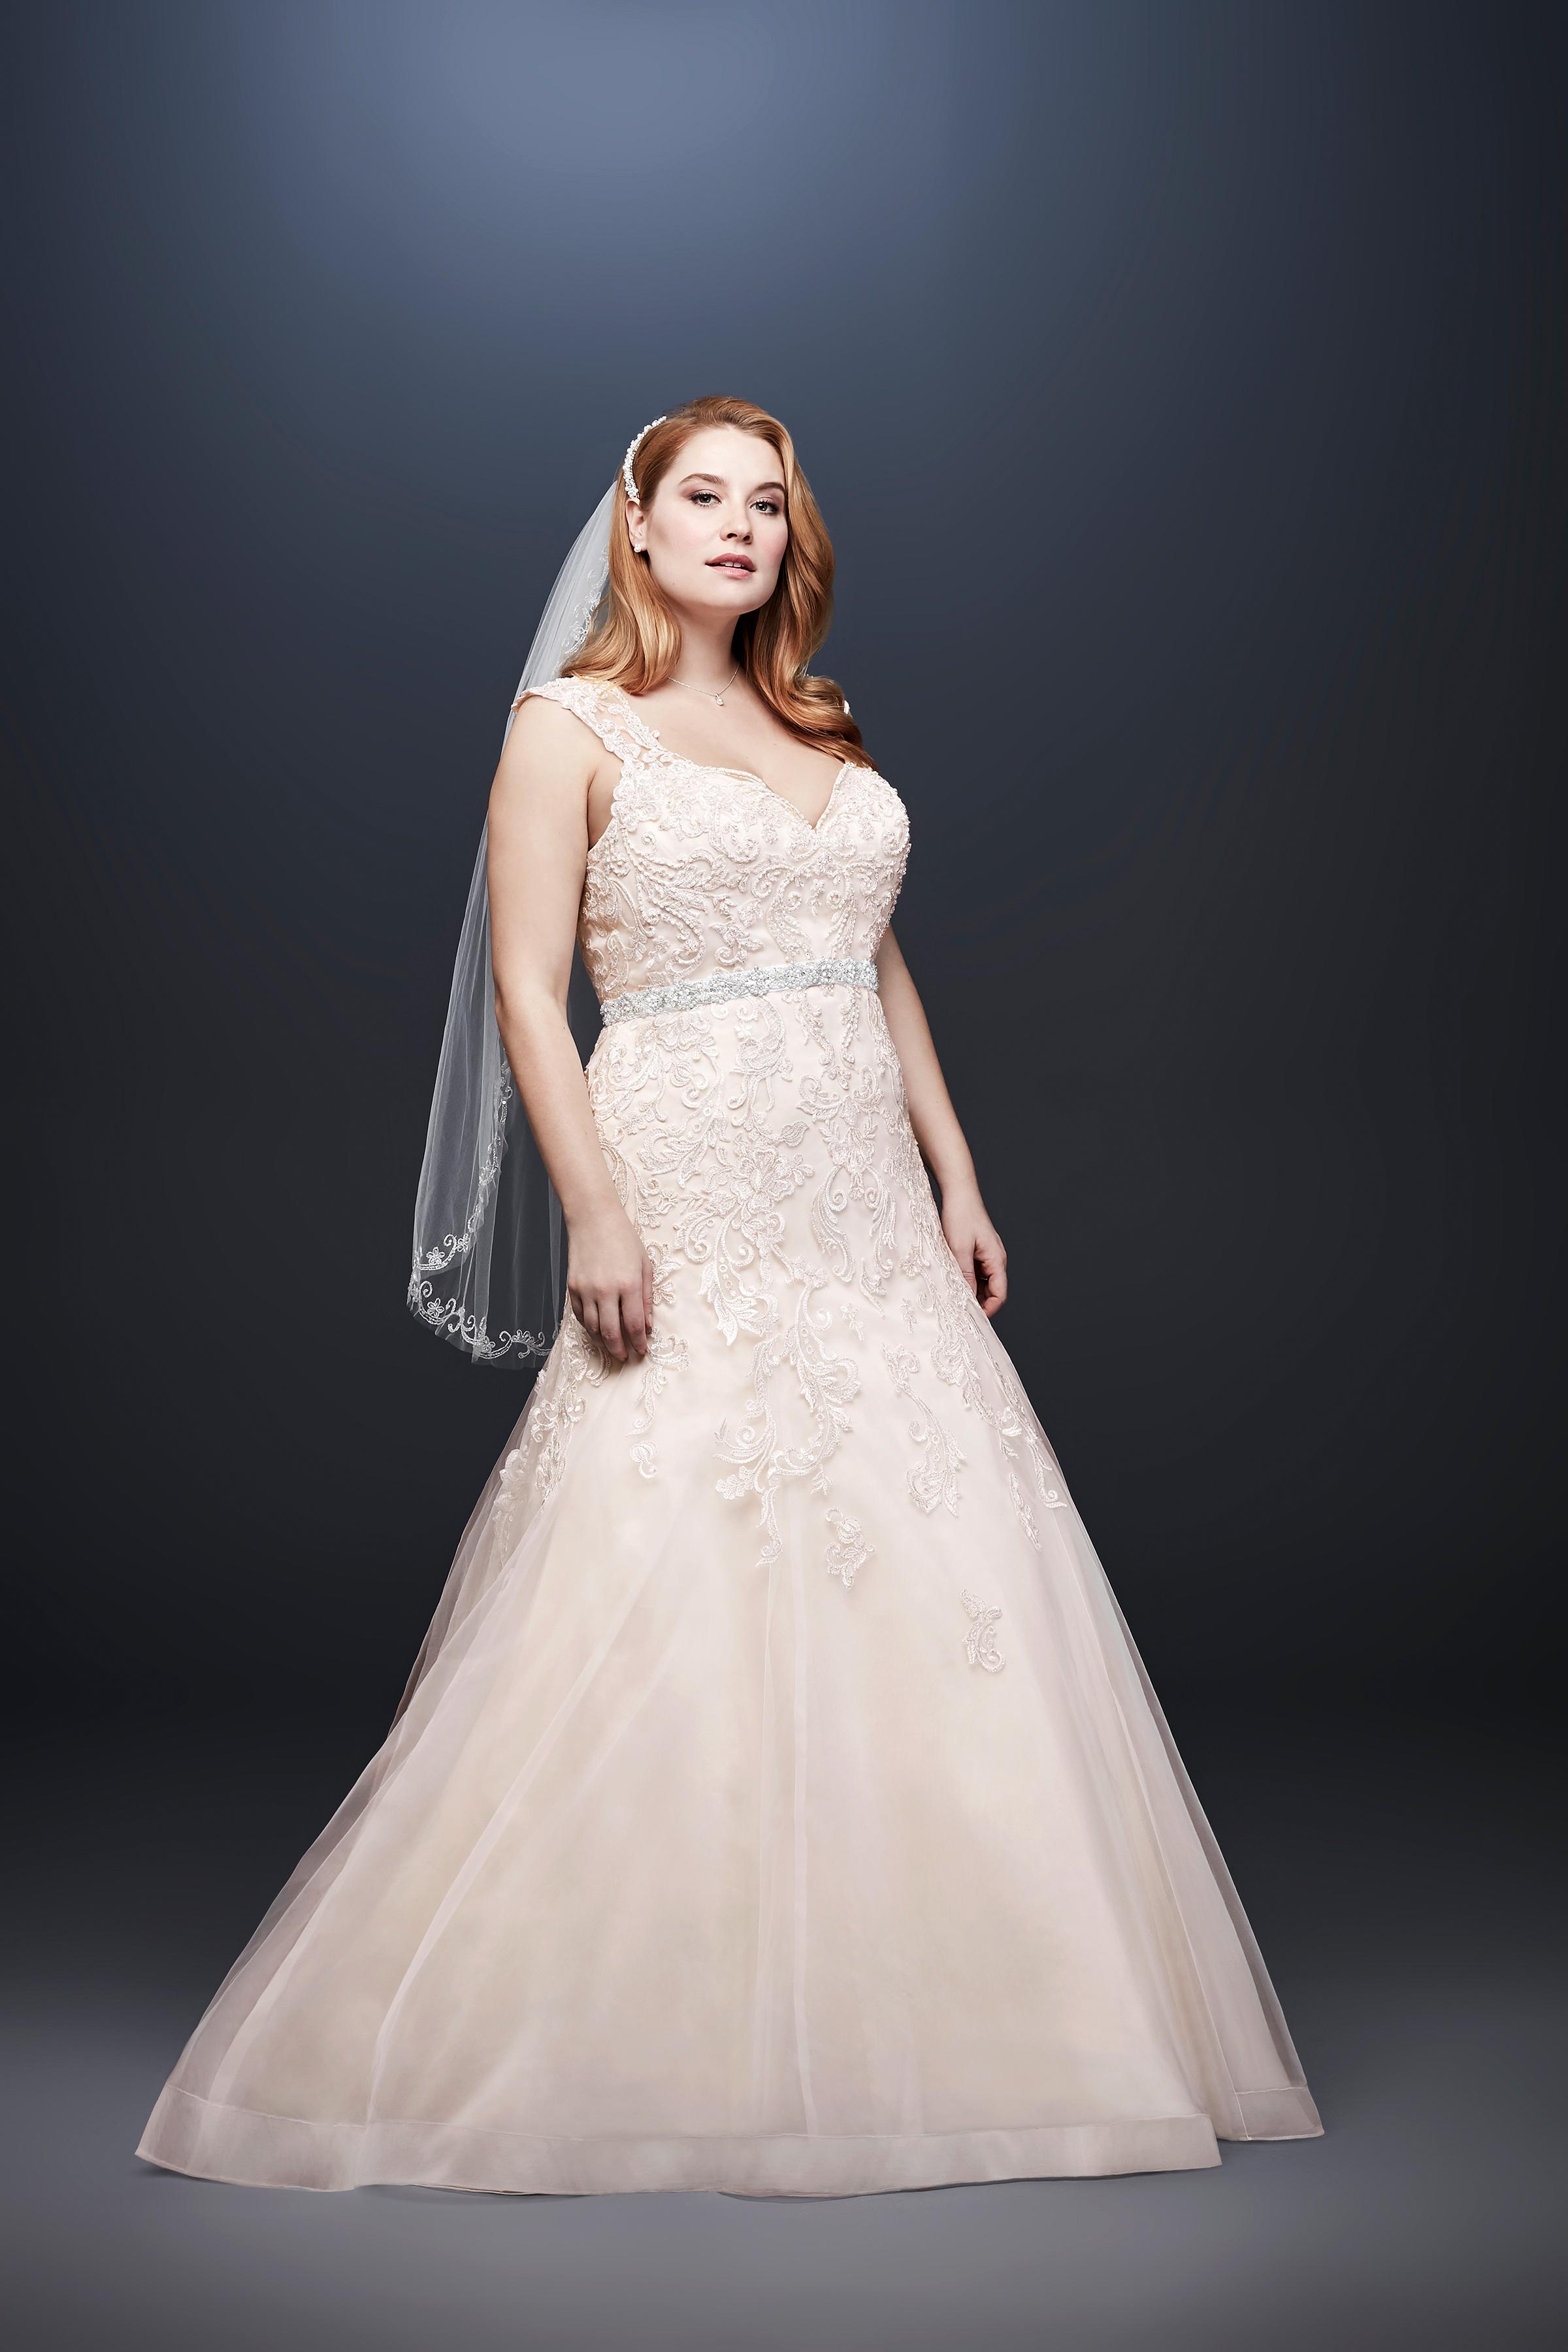 david bridal wedding dress spring 2019 sleeveless beaded belt lace